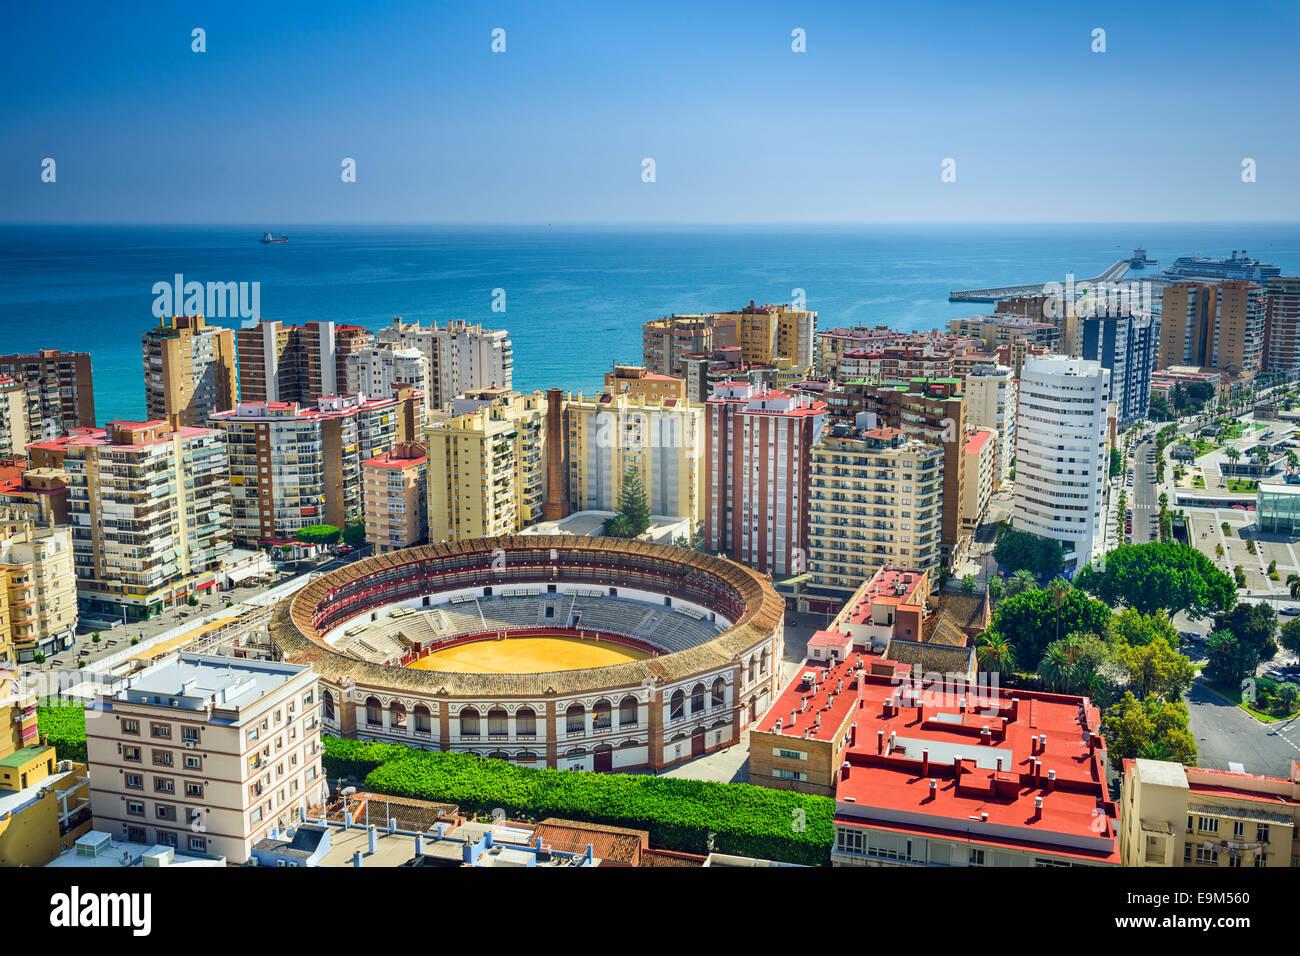 Málaga, España paisaje urbano en la plaza de toros. Imagen De Stock